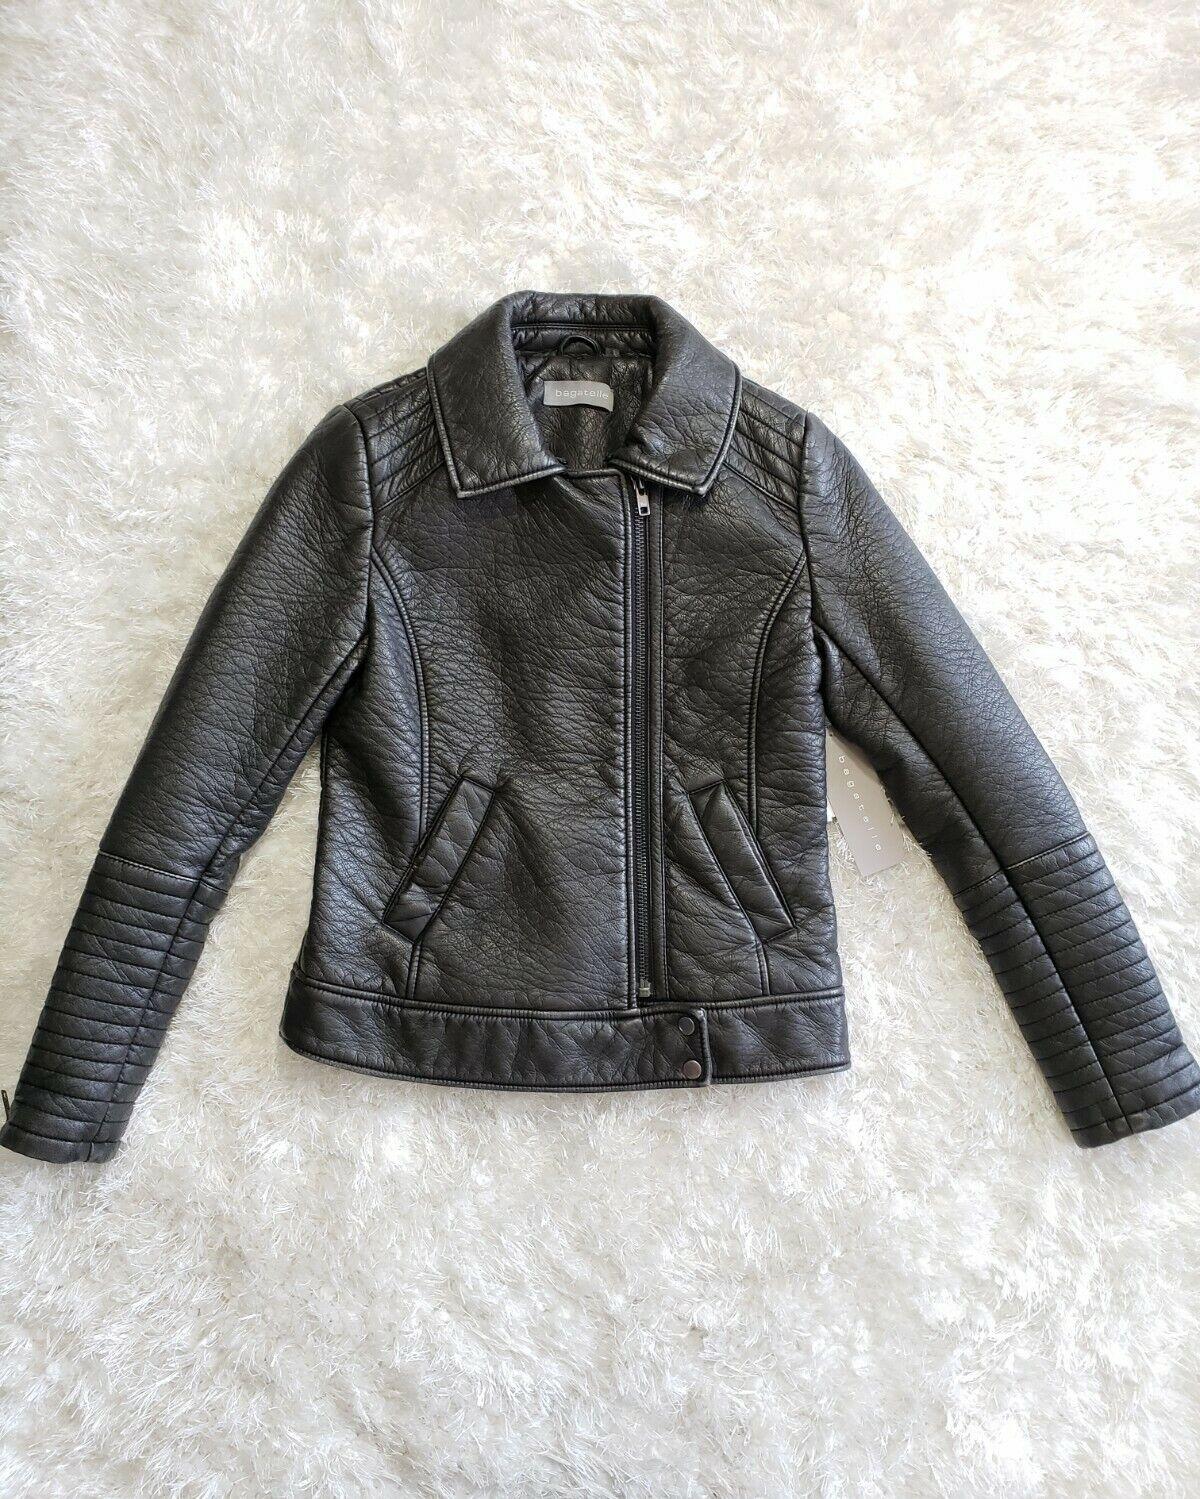 🌺NWT Bagatelle Slate Black Faux Leather Women's Moto Jacket Sz Small MSRP